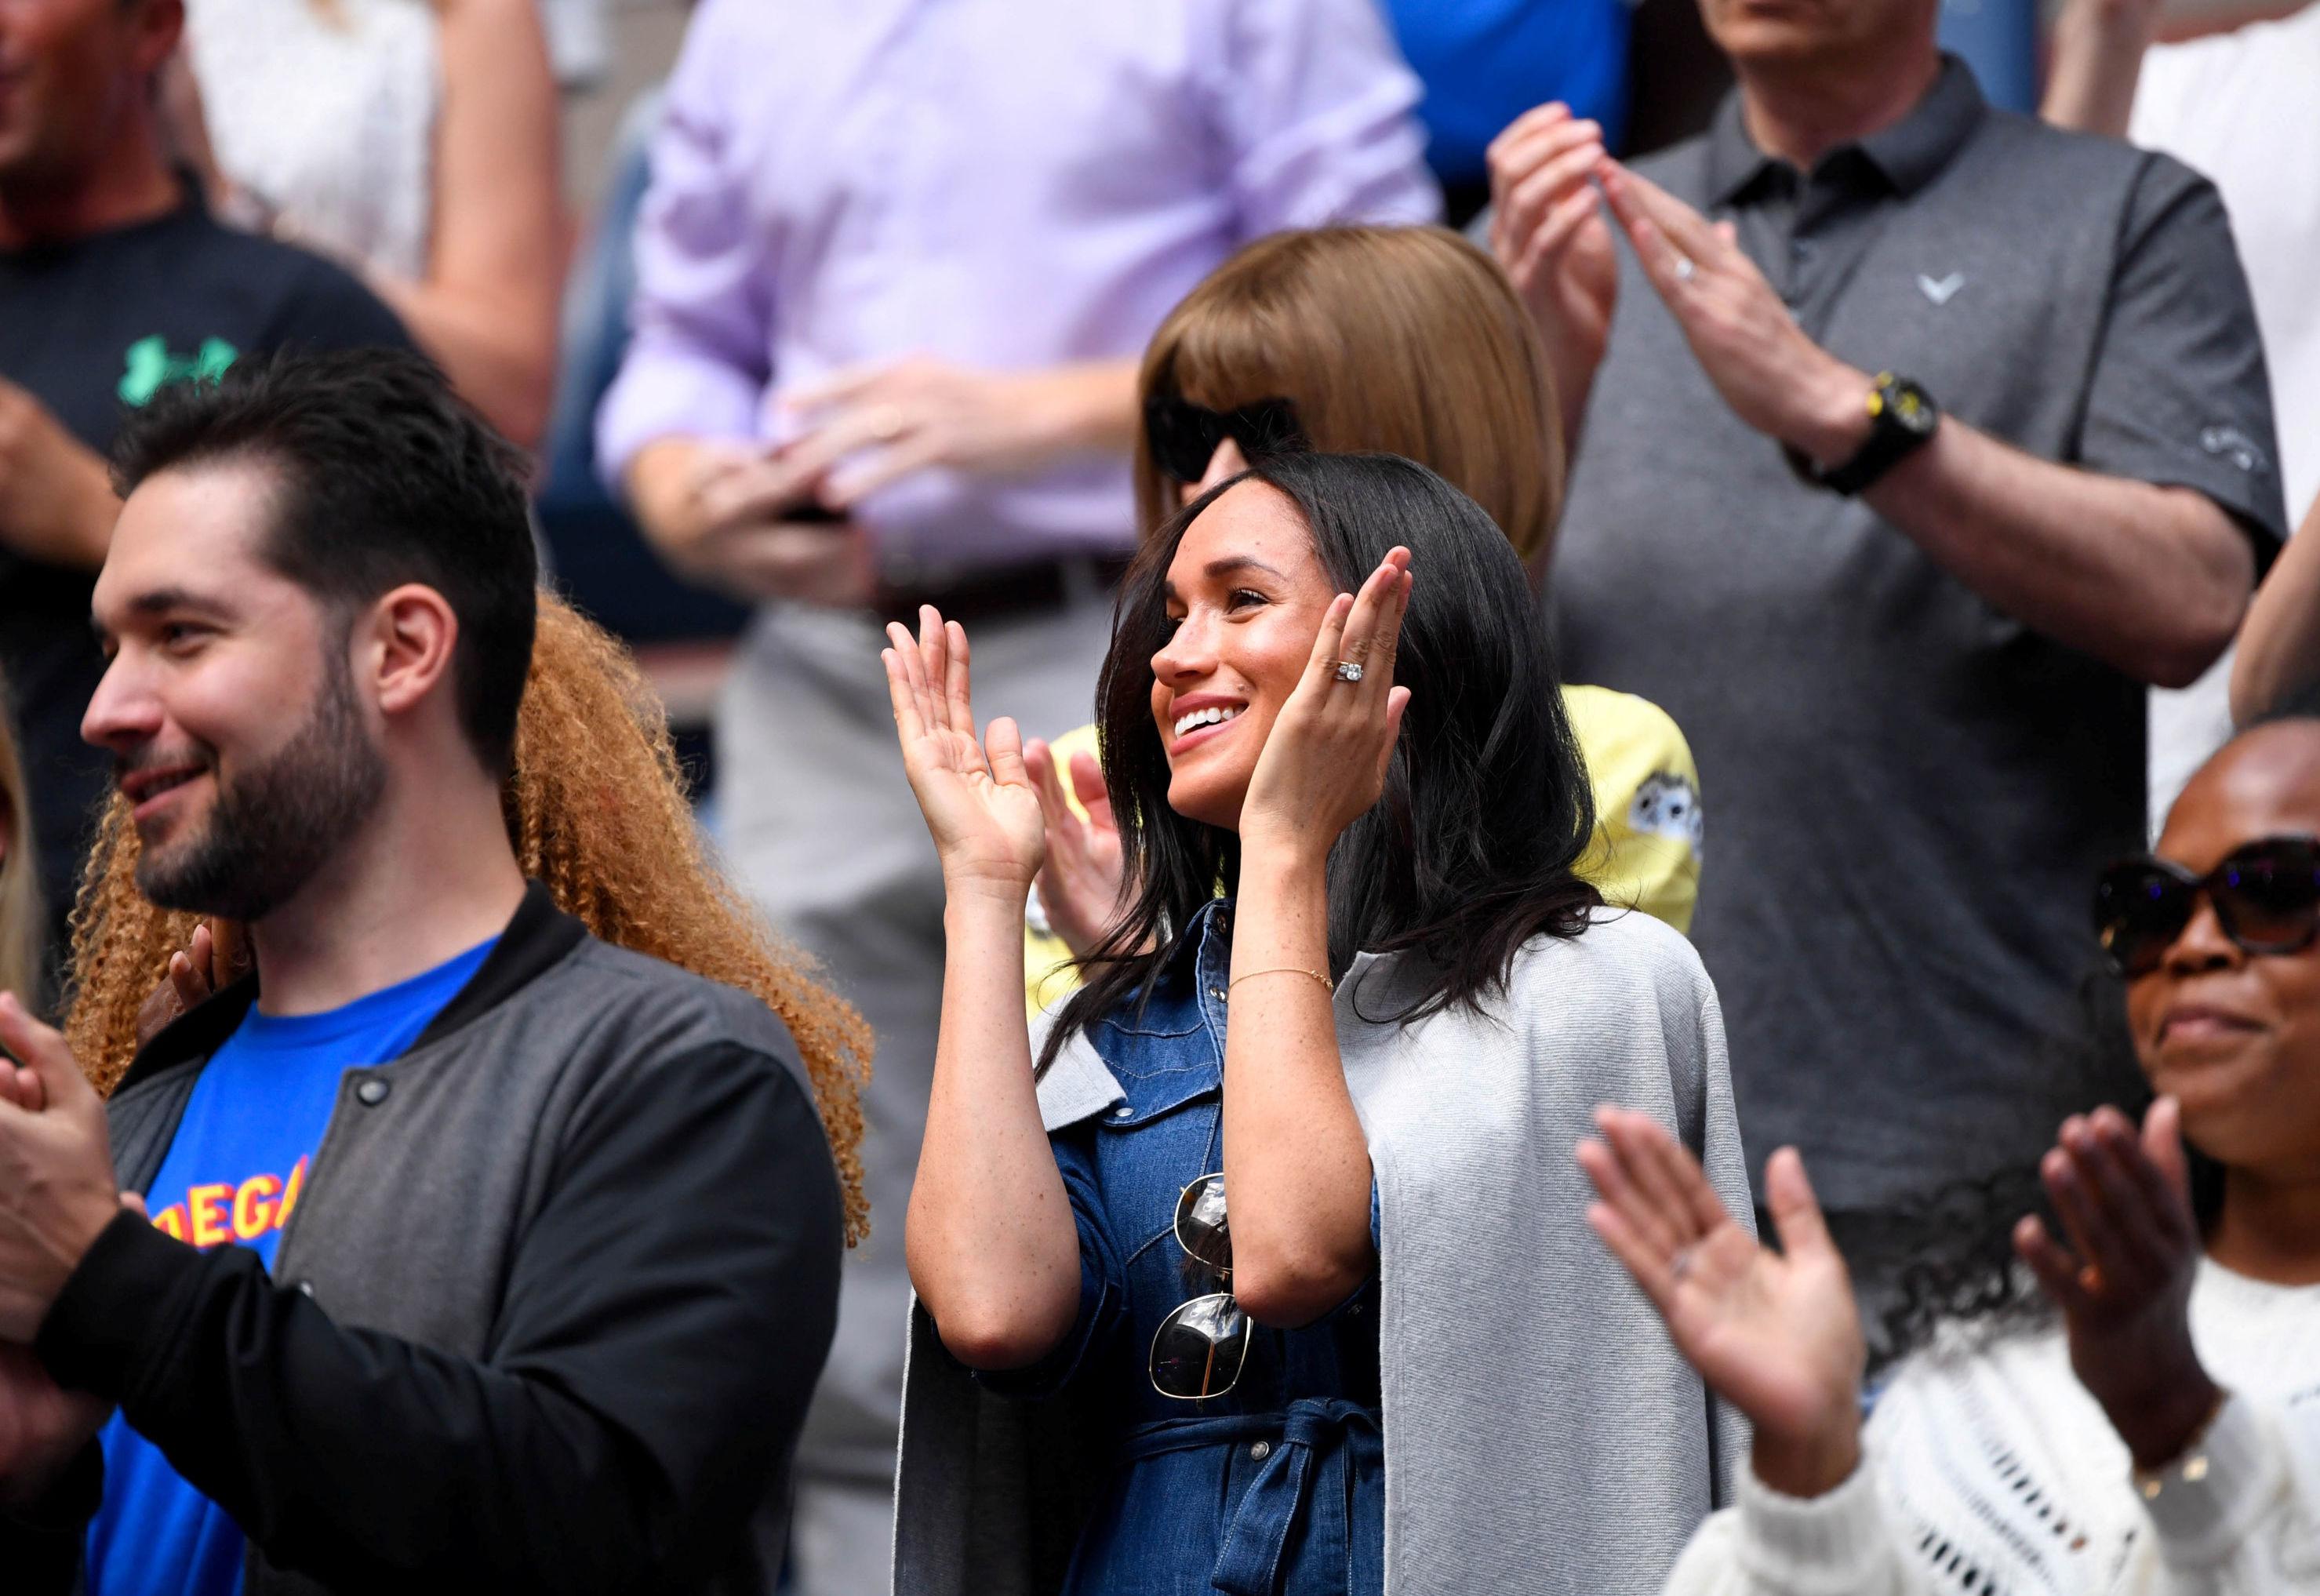 Meghan Markle asiste a la final femenina del US Open en Nueva York